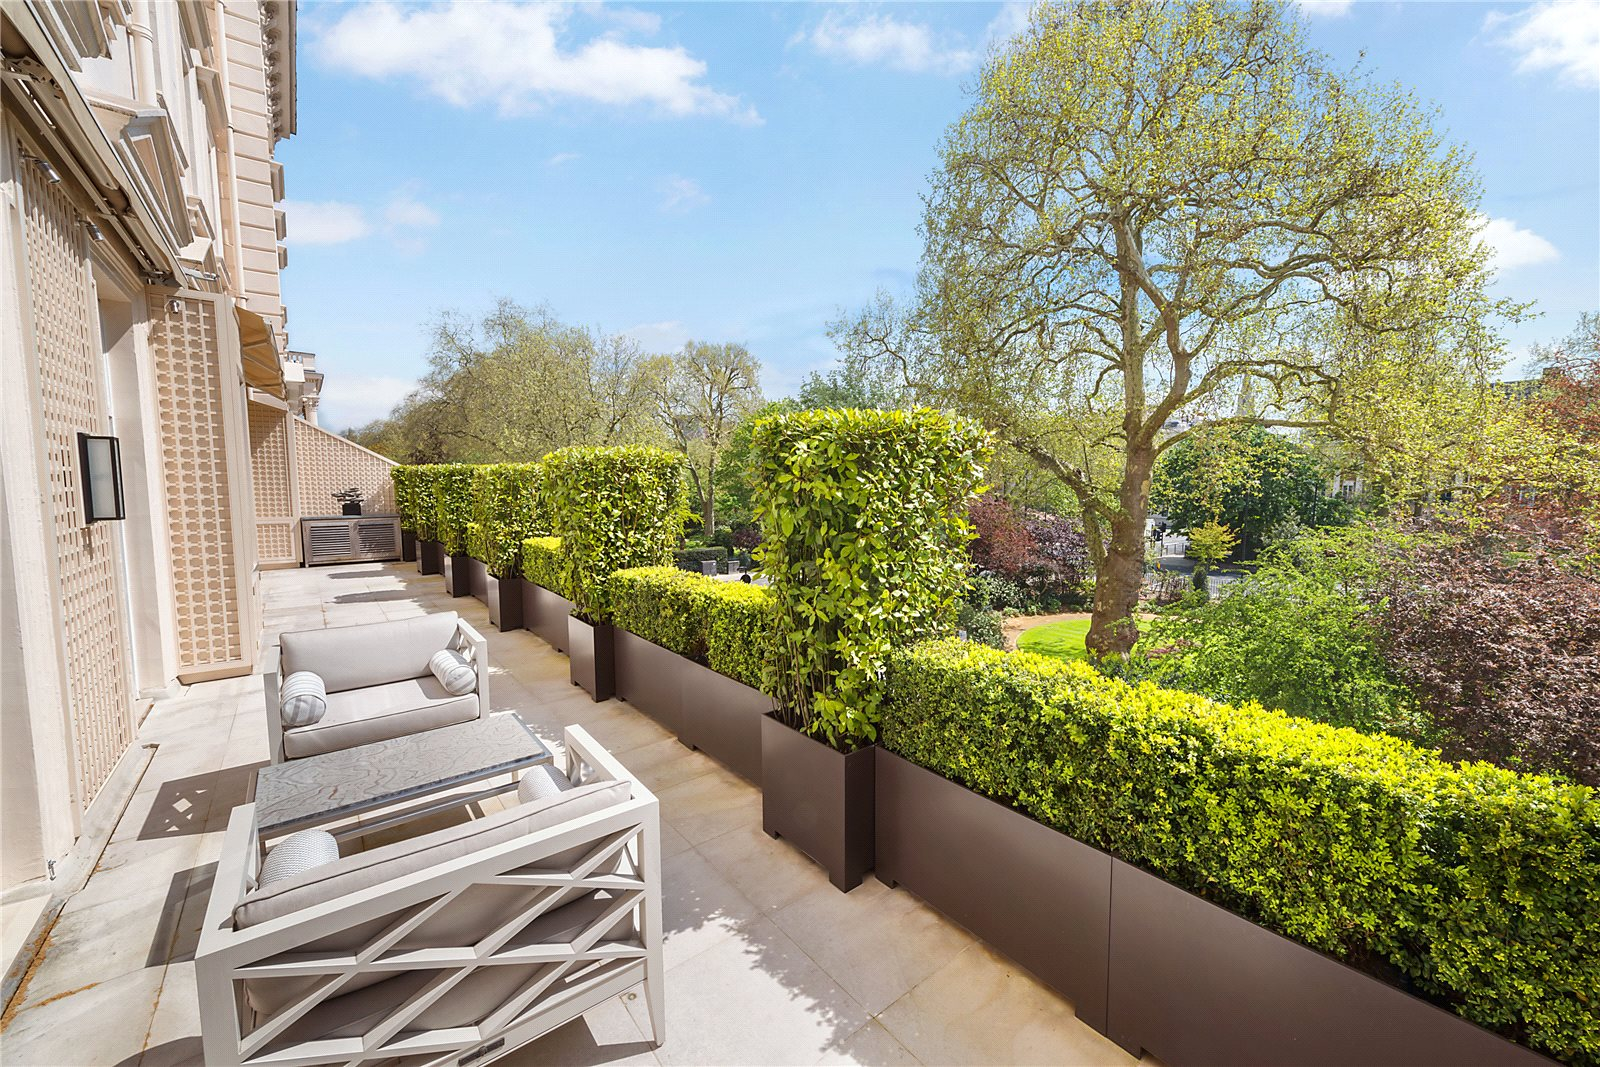 Apartments / Residences for Sale at Eaton Square, Belgravia, London, SW1W Belgravia, London, England